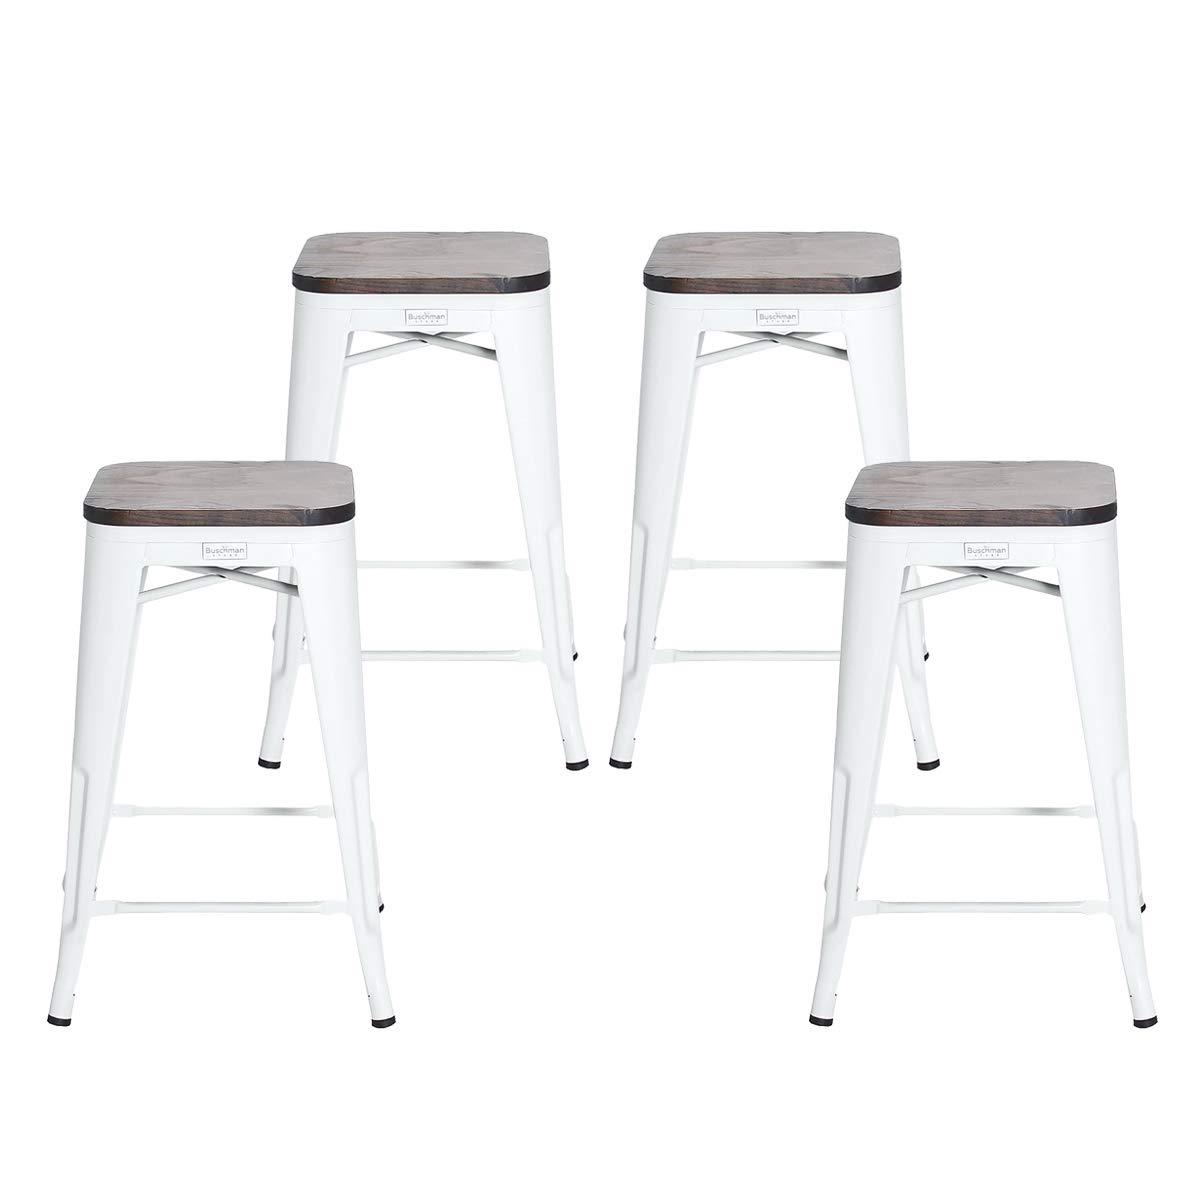 Buschman Set of 4 Matte White Wooden Seat 26 Inch Counter Height Metal Bar Stools, Indoor/Outdoor, Stackable by Buschman Store